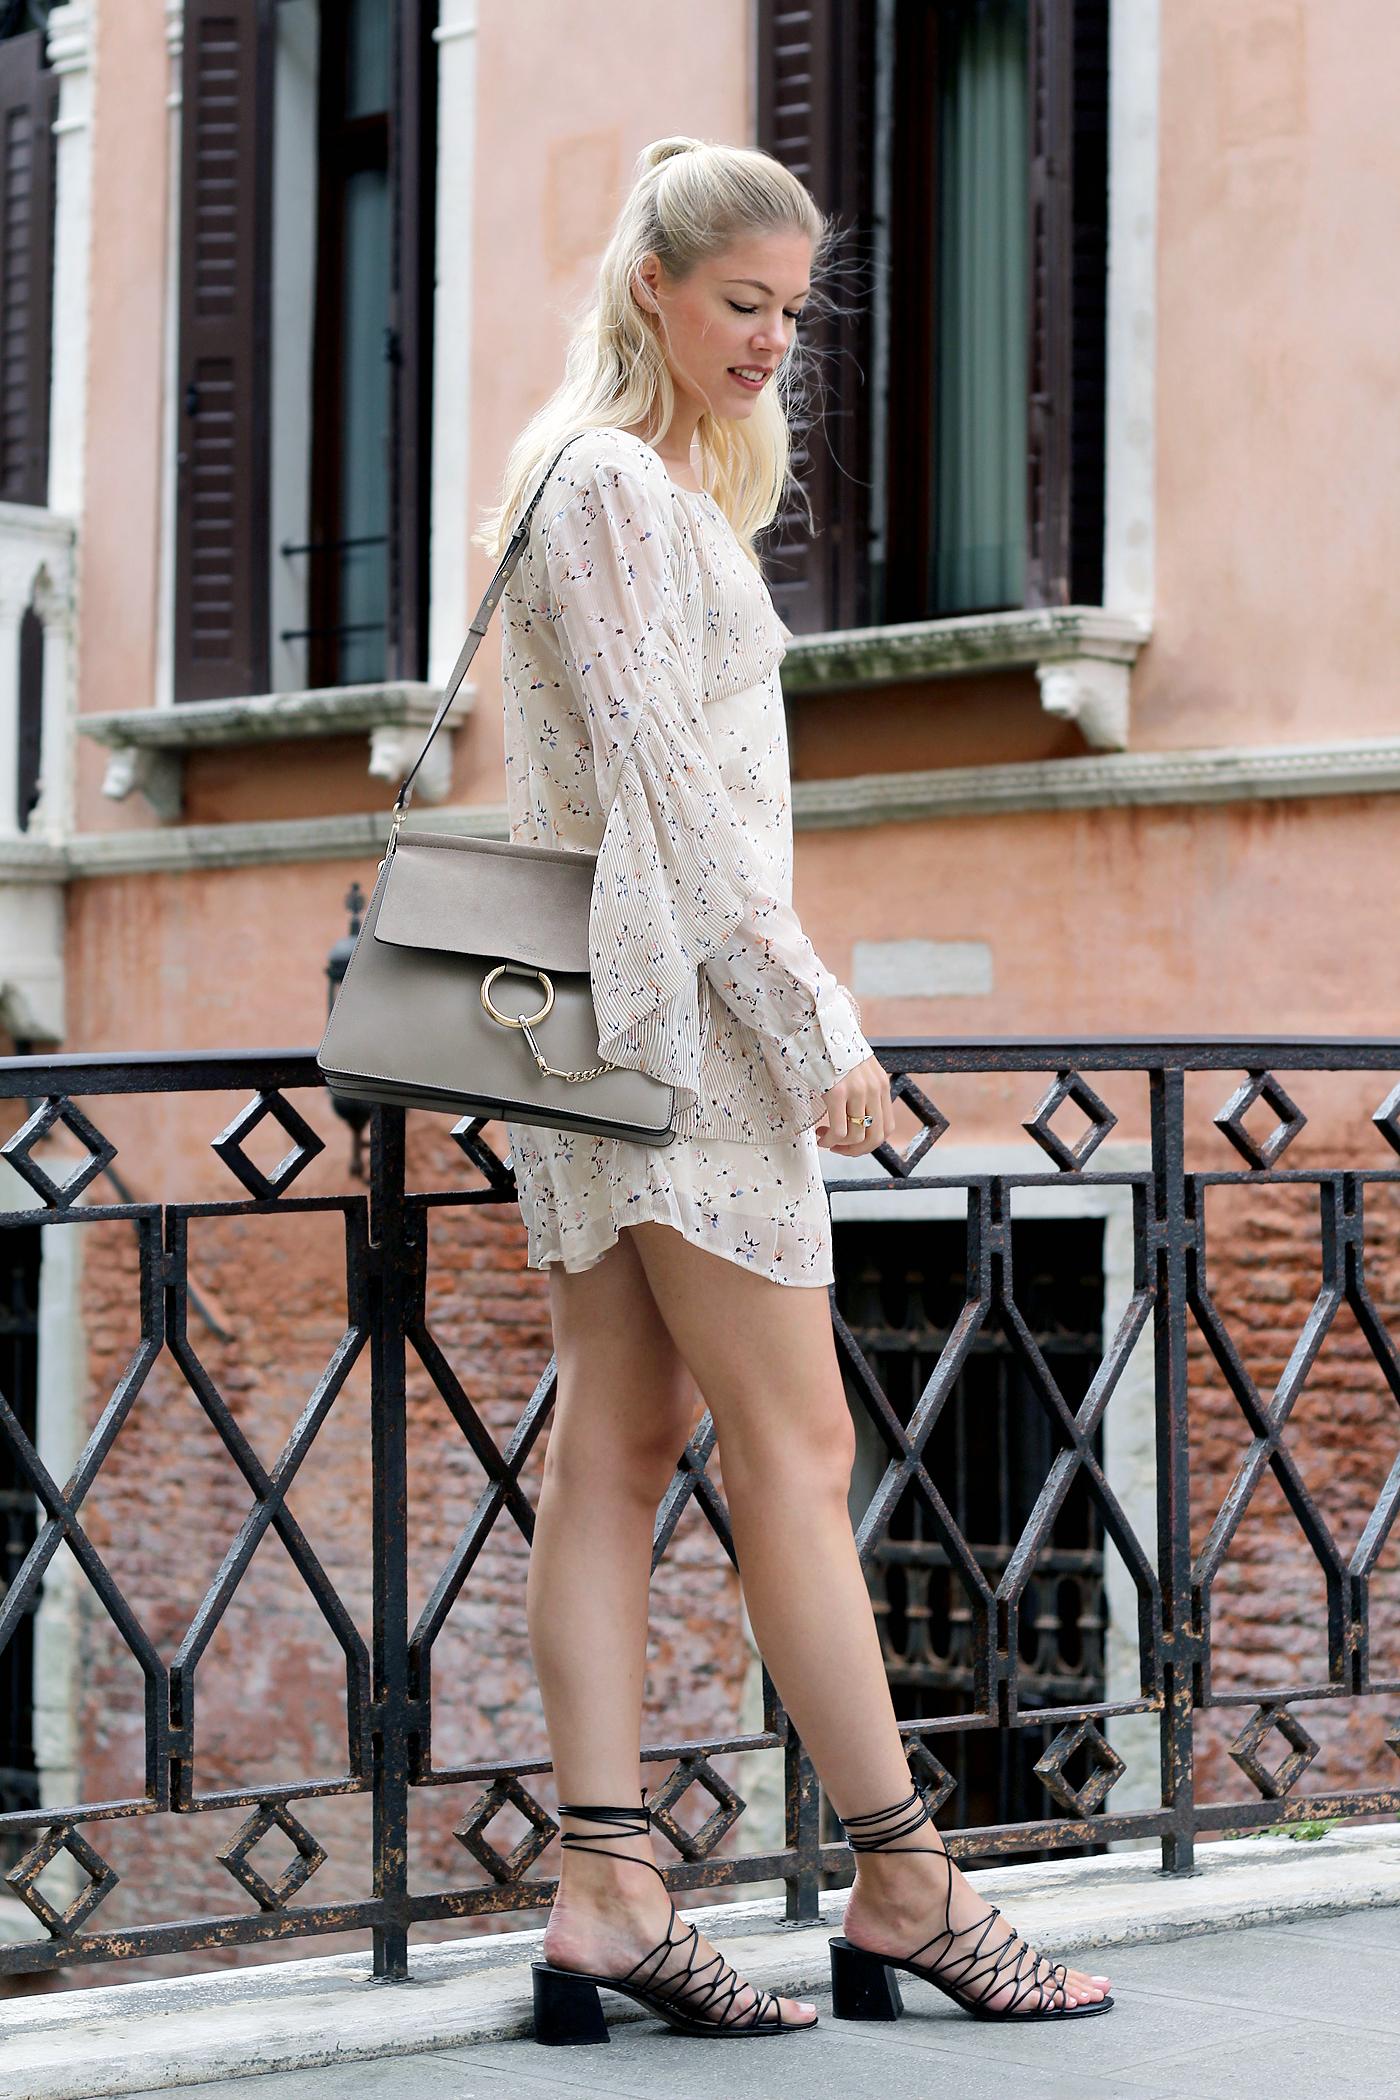 fashionblog_somehappyshoes_venice_asos_dress_chloe1